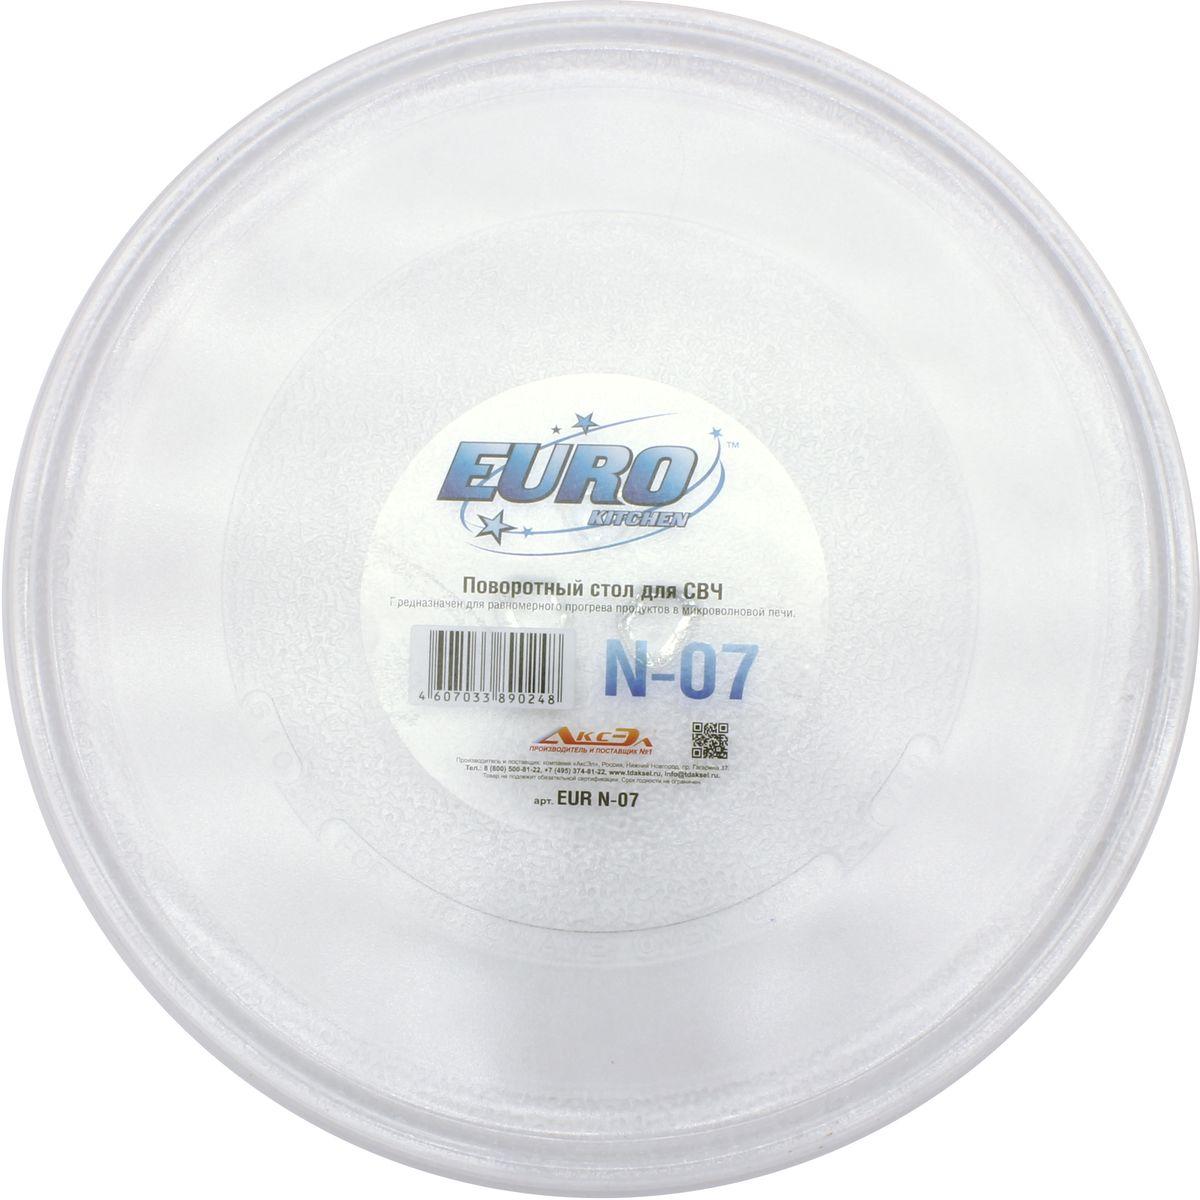 Euro Kitchen N-07 тарелка для СВЧN-07Универсальная тарелка N-07 для микроволновой печи с куплером. Диаметр тарелки 265 мм. Изготовлена из специального жаропрочного стекла. Предназначена для равномерного разогрева продуктов в микроволновой печи.Подходит для брендов:Aeg, Airhot, Amica, Ardo, Ariston, Asko, Atlanta, Aurora, Ava, Barazza, Bauknecht, Bbk, Beko, Bomann, Bork, Bosch, Brandt, Candy, Cata, Centek, Clatronic, Daewoo, De dietrich, Delfa, Electrolux, Elenberg, Ergo, Erisson, Eurotec, Fagor, Fimar, Foster, Franke, Fulgor, Fusion, Gaggenau, Gastrorag, Goldstar, Gorenje, Hankel, Hansa, Hilton, Horizont, Hurakan, Hyundai, Ilve, Indesit, Kaiser, Kenmore, Kenwood, Korting, Kuppersberg, Kuppersbusch, Kamark, Keran, Lg, Liberton, Liberty, Maxwell, Menumaster, Midea, Miele, Moulinex, Mystery, Neff, Oursson, Panasonic, Proficook, Rainford, Redmond, Rolsen, Samsung, Saturn, Scarlett, Sencor, Sharp, Siemens, Simfer, Sinbo, Sirman, Smeg, Supra, Teka, Thomson, Toshiba, V-zug, Vasko, Vimar, Vitek, Vr, Weissgauff, West, Whirlpool, Zanussi, Zelmer, Zigmund&Shtain, Витязь, Рубин.